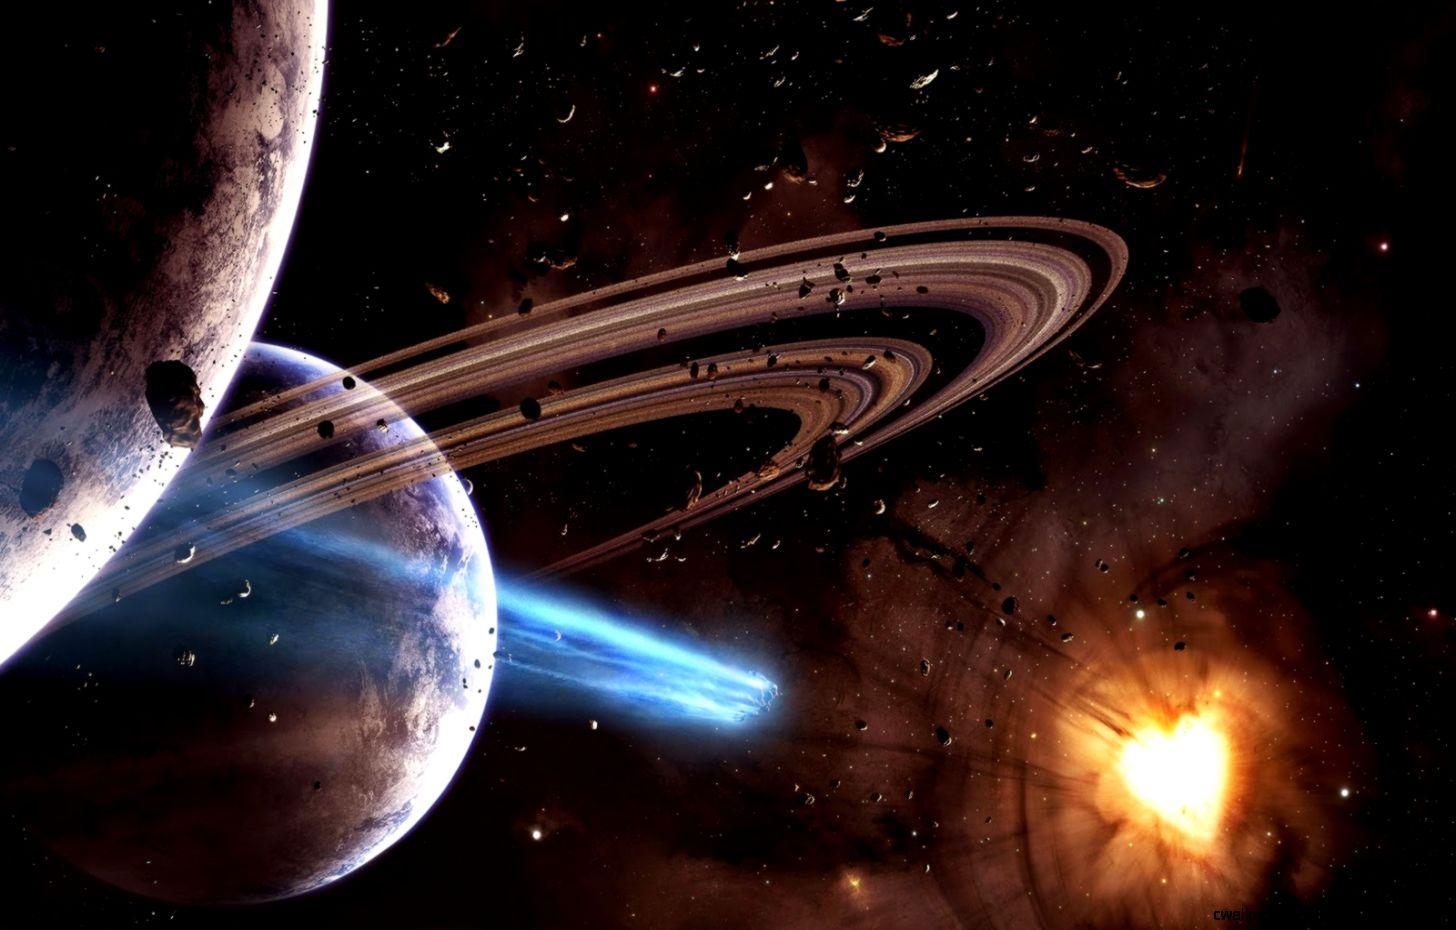 High Resolution Space Wallpapers   WallpaperSafari